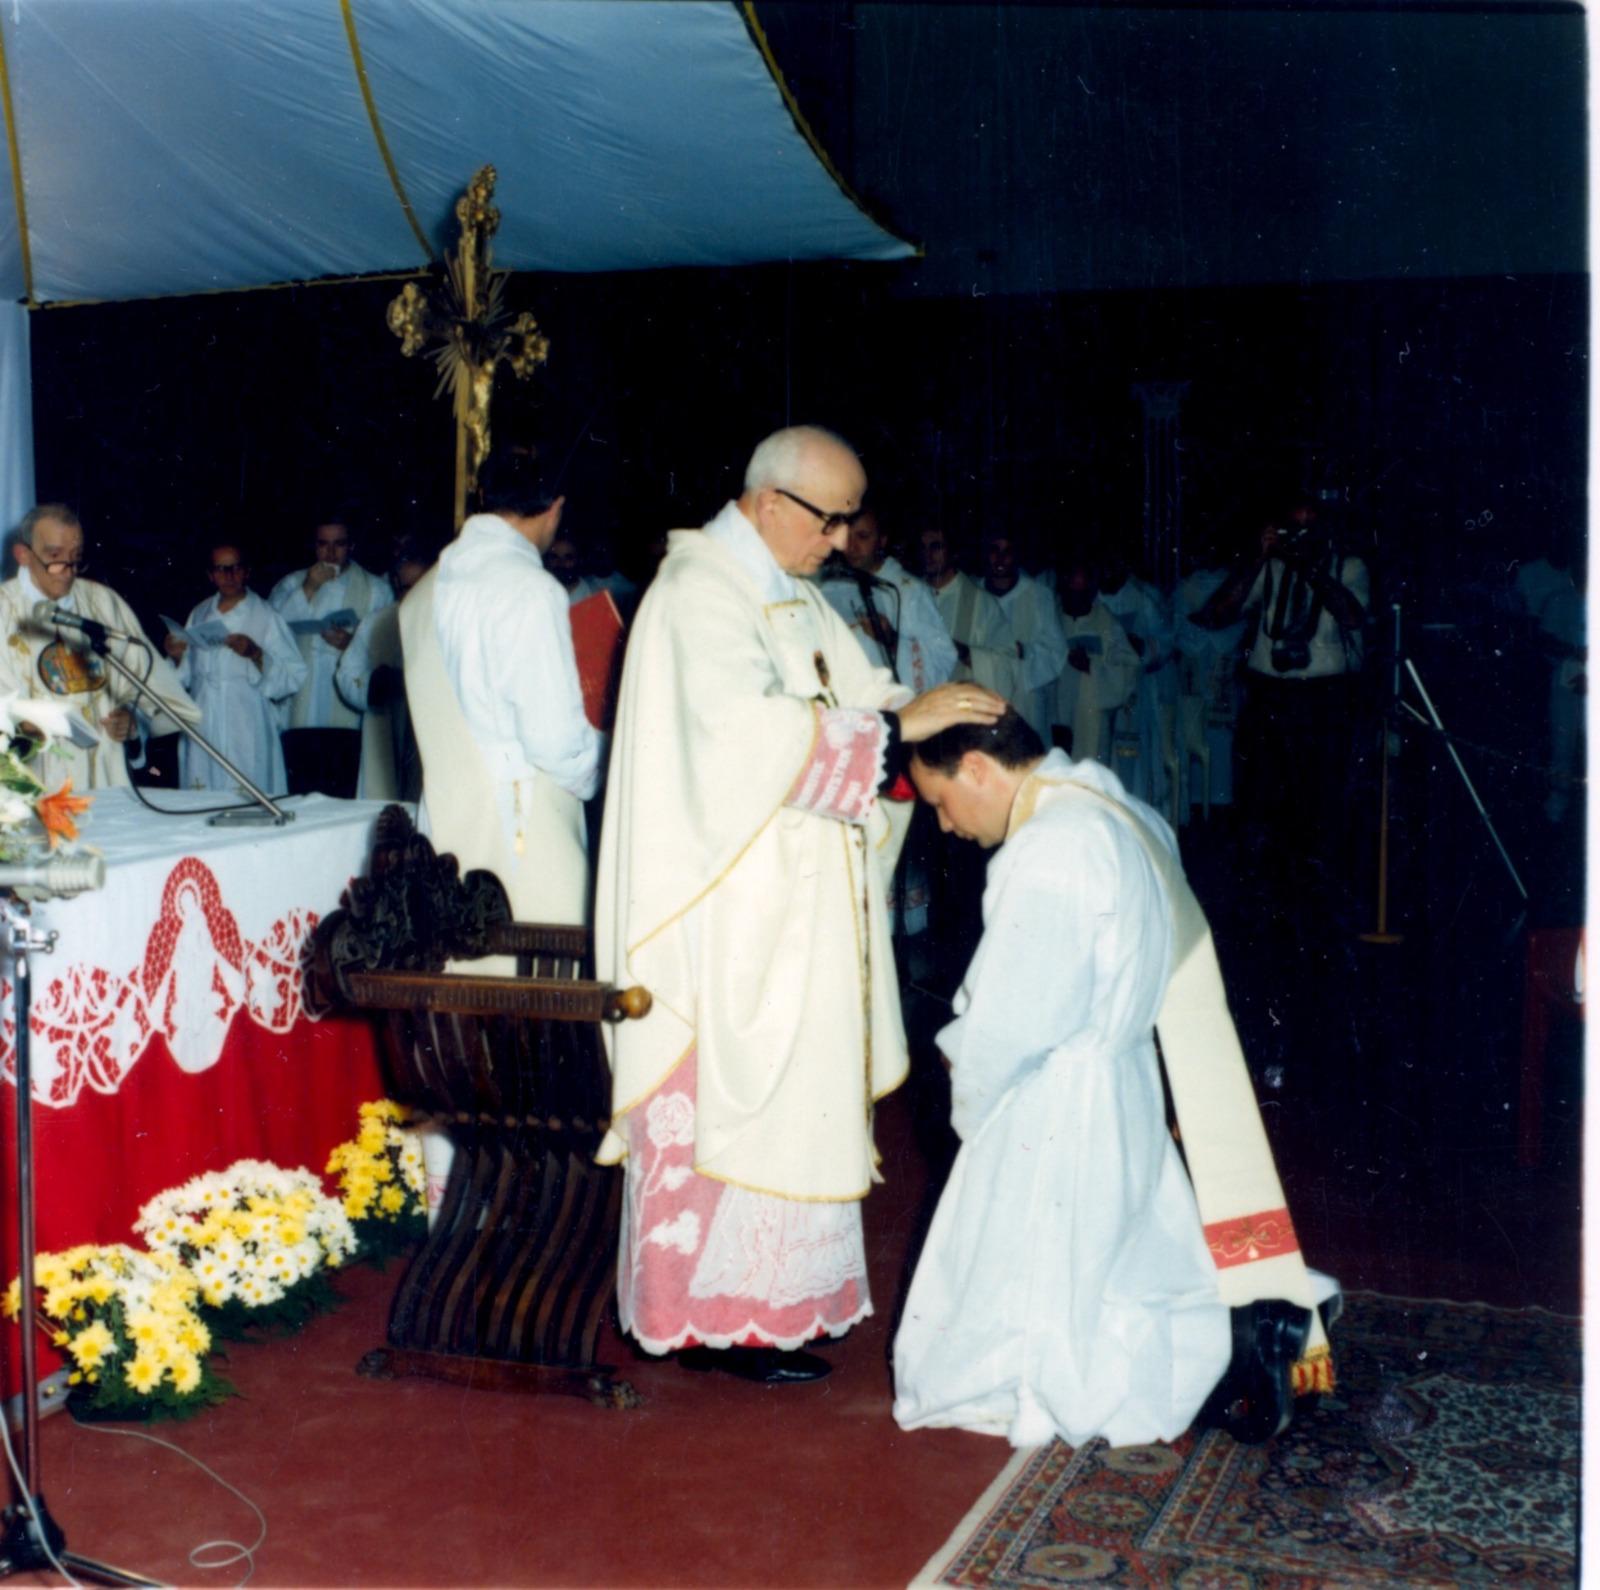 Anniversario ordinazione sacerdotale don Luca Ferrari